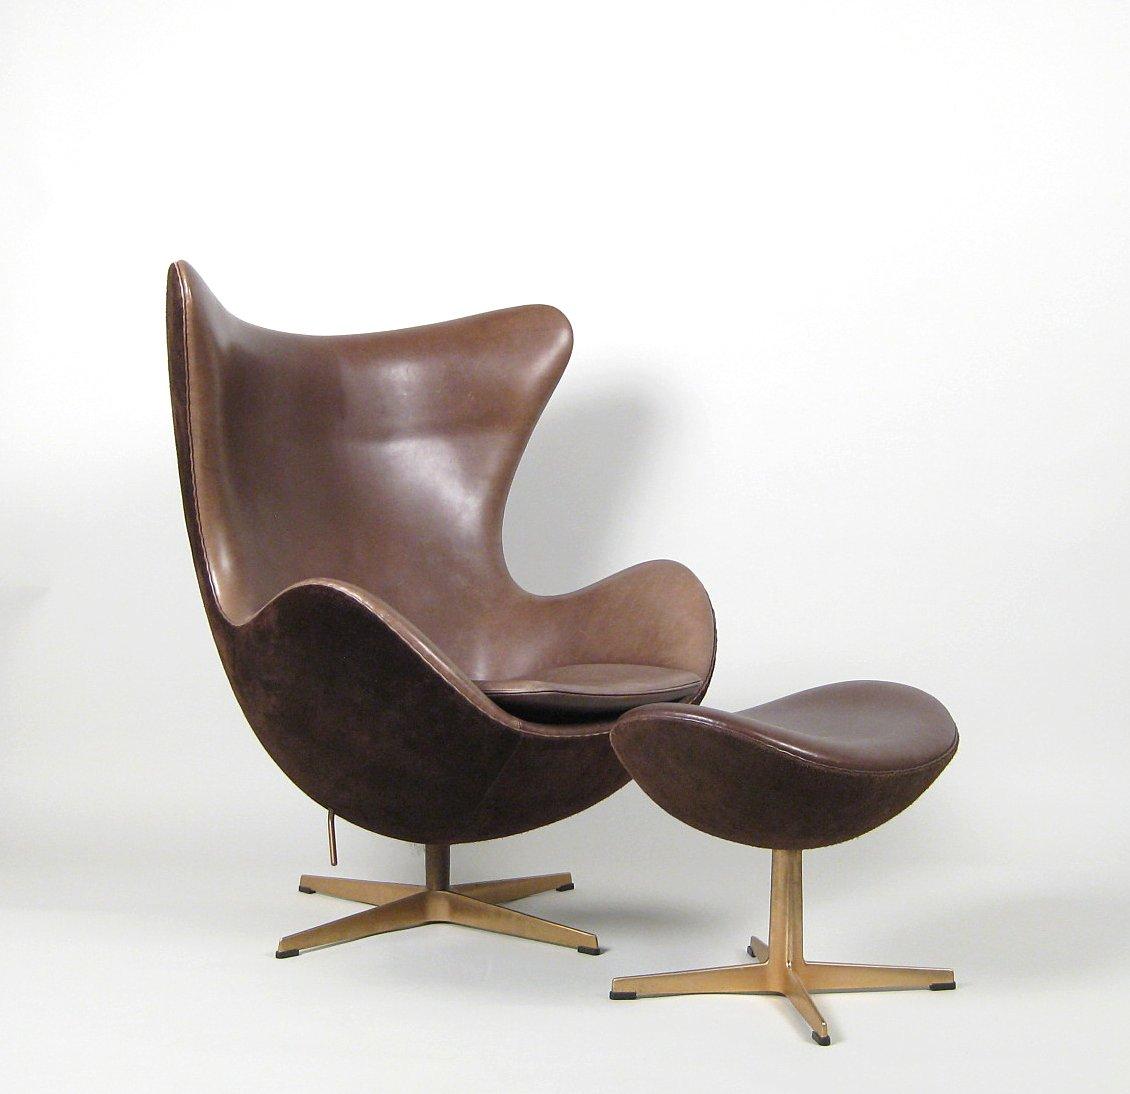 Arne Jacobsen, A Lounge Chair, Model Egg Chair 3316, Anniversary Model U0027Det  Gyldne ægu0027 + Ottomane 3127 By Fritz Hansen (2) This Lot Has Been Put Up For  ...